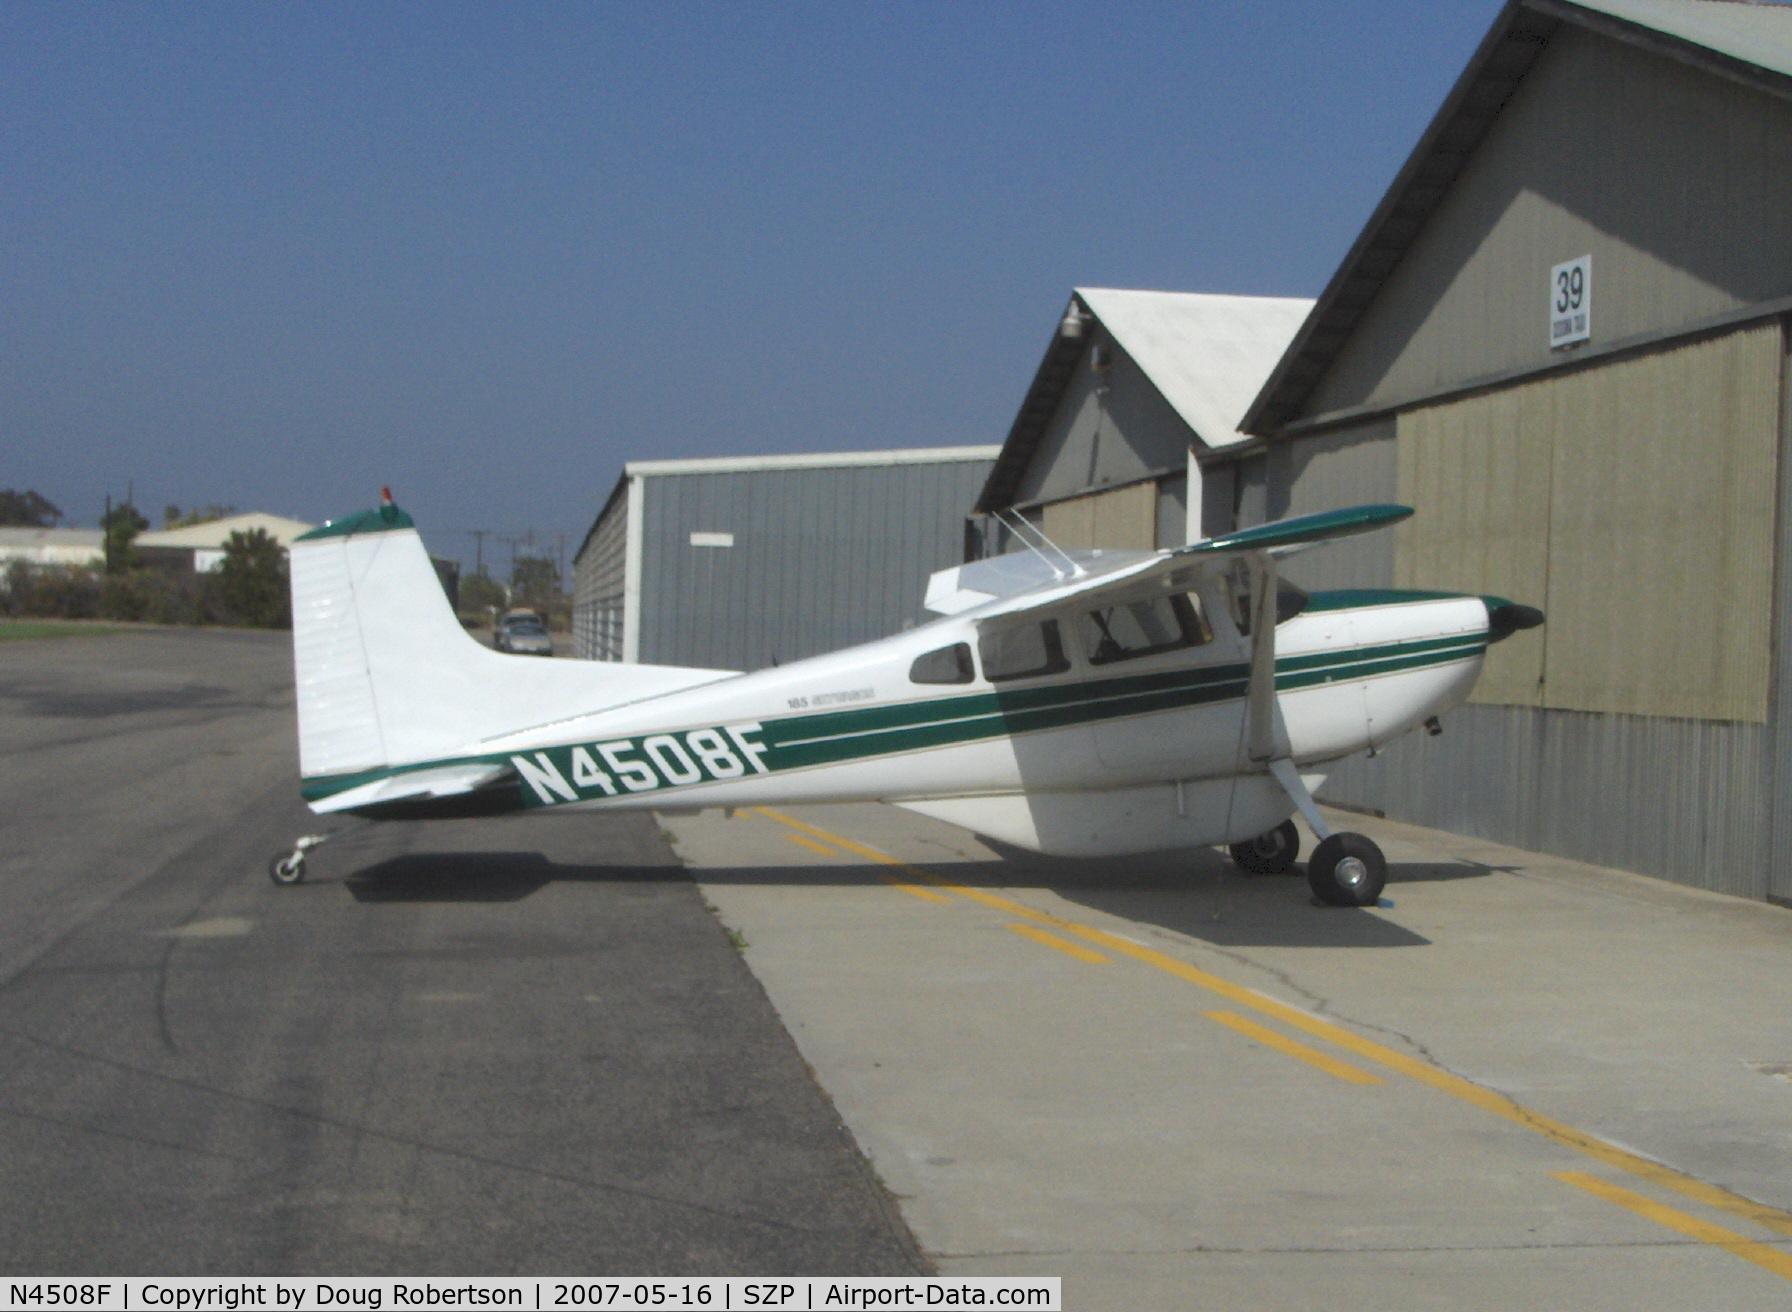 Aircraft N4508F (1966 Cessna 185E Skywagon C/N 185-0990